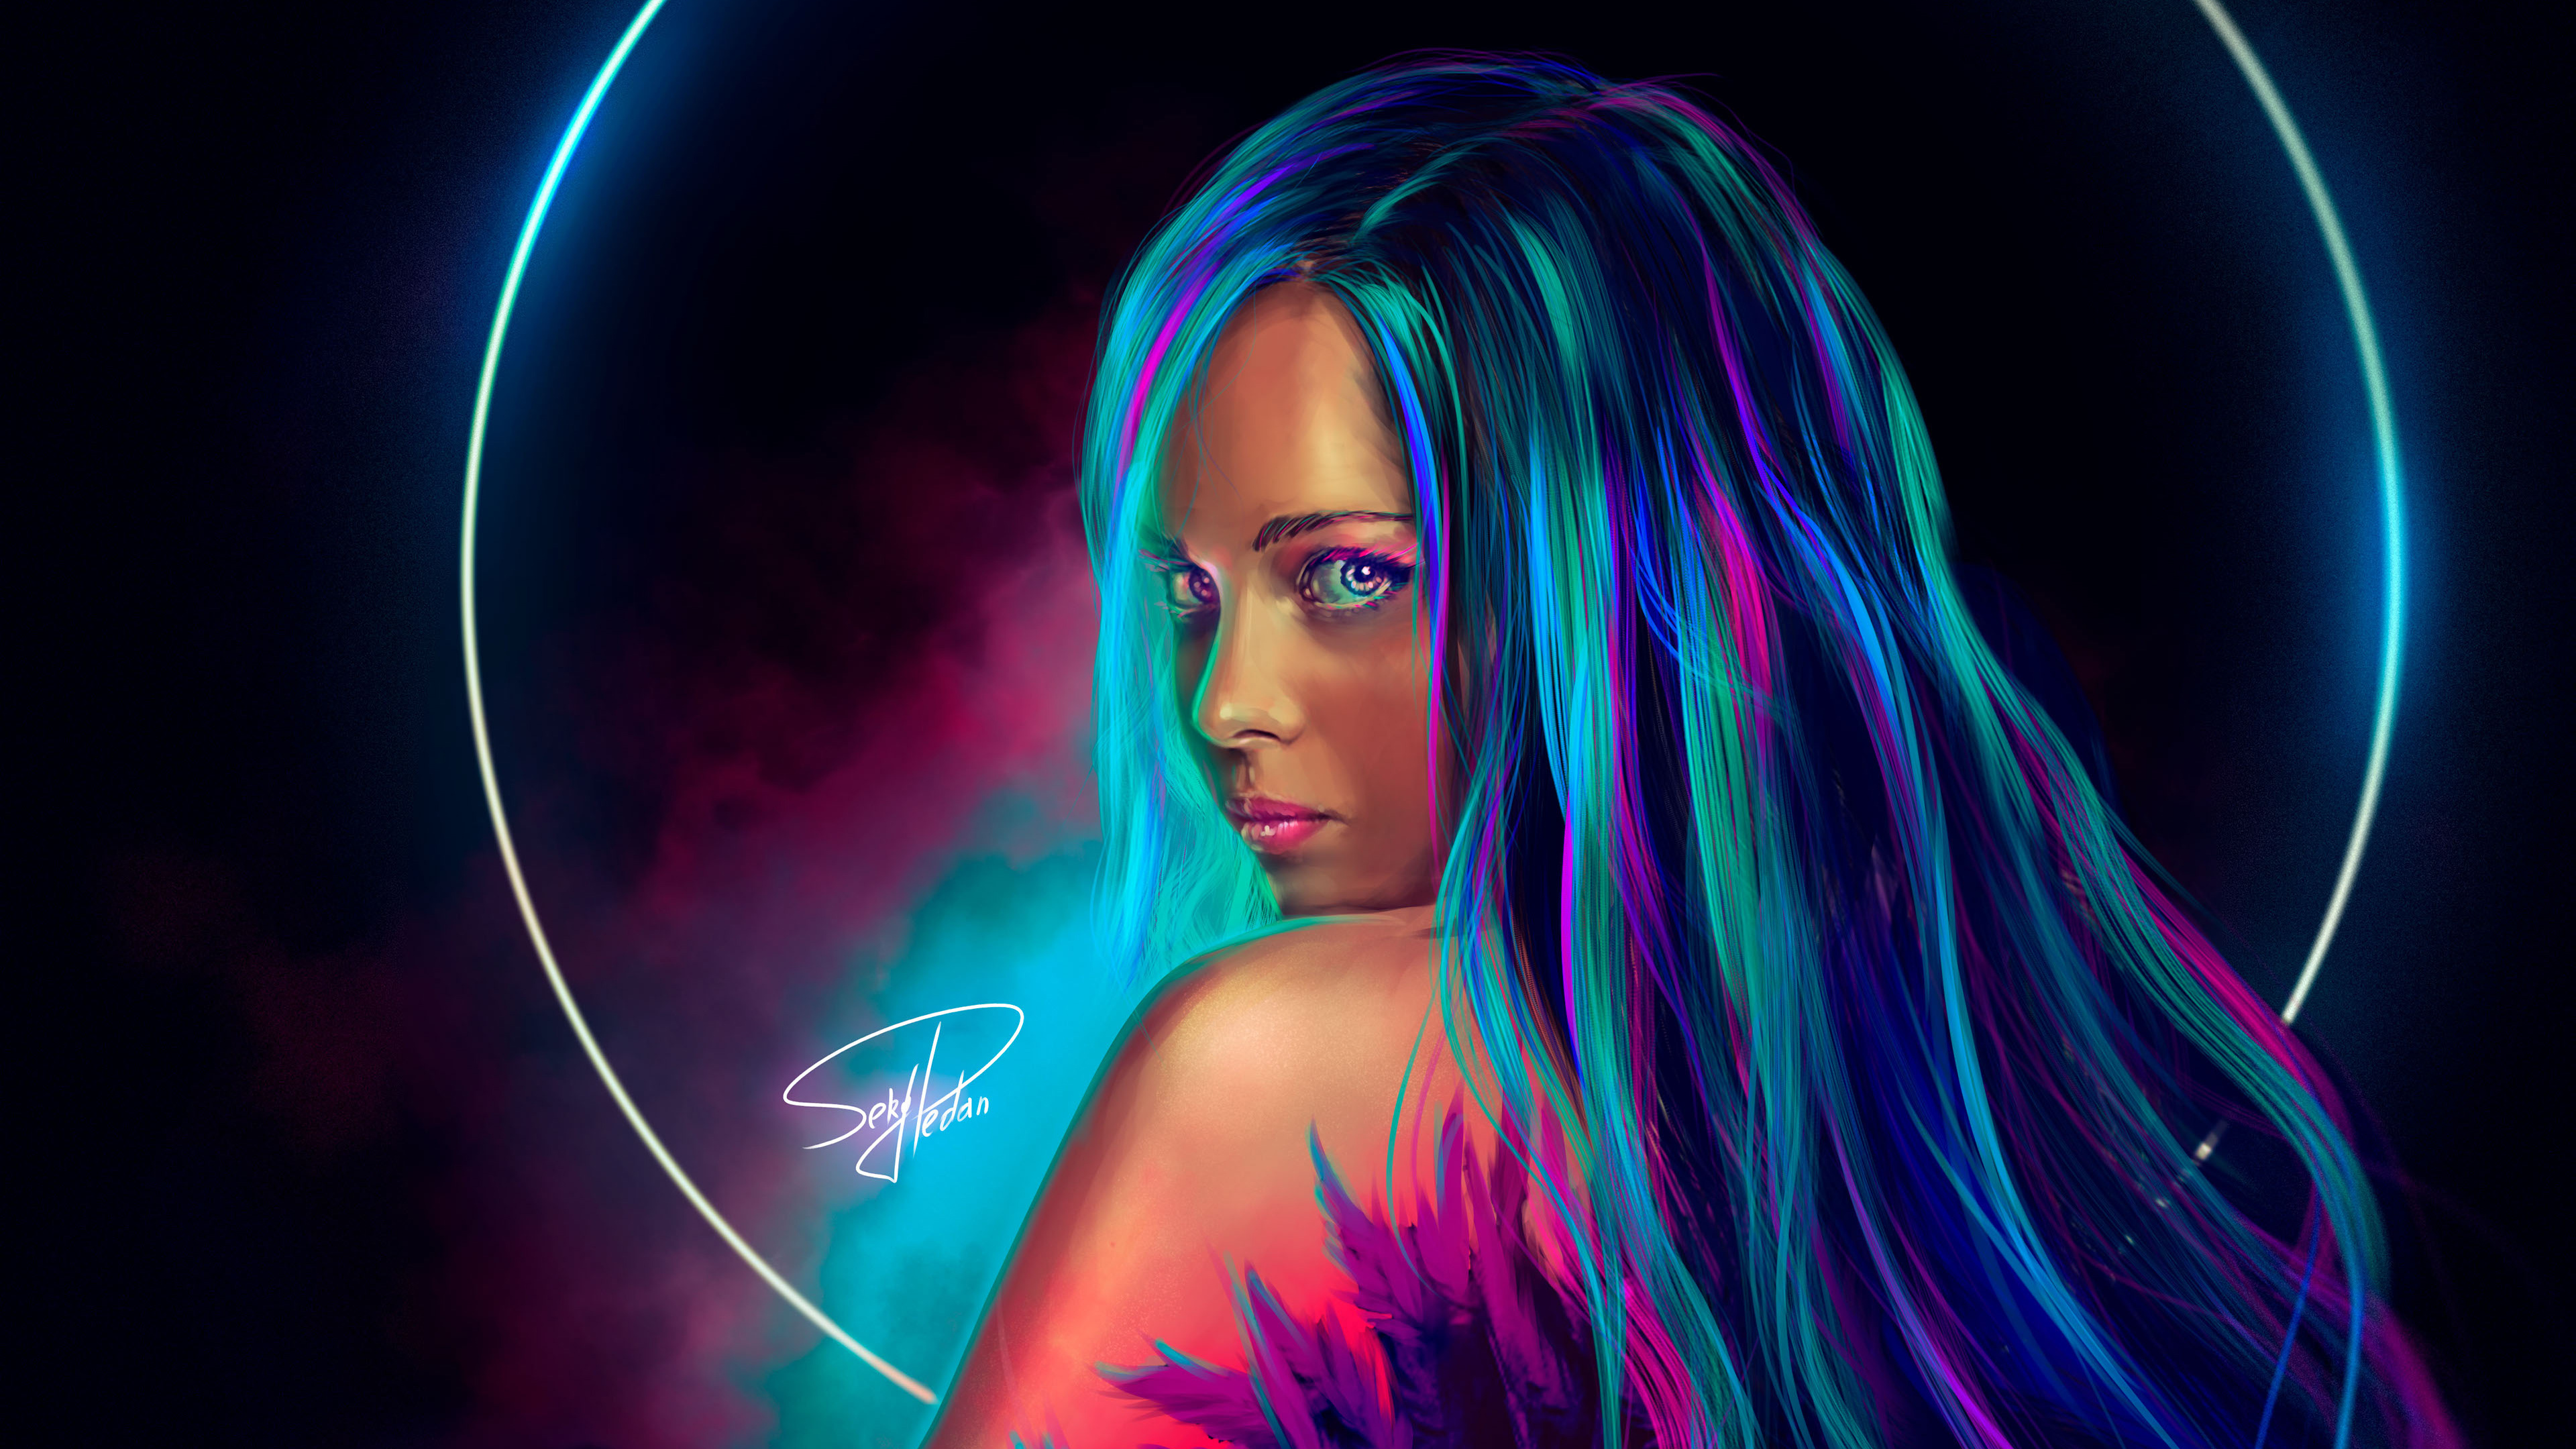 2160x3840 neon girl digital art sony xperia x xz z5 - Art wallpaper 2160x3840 ...